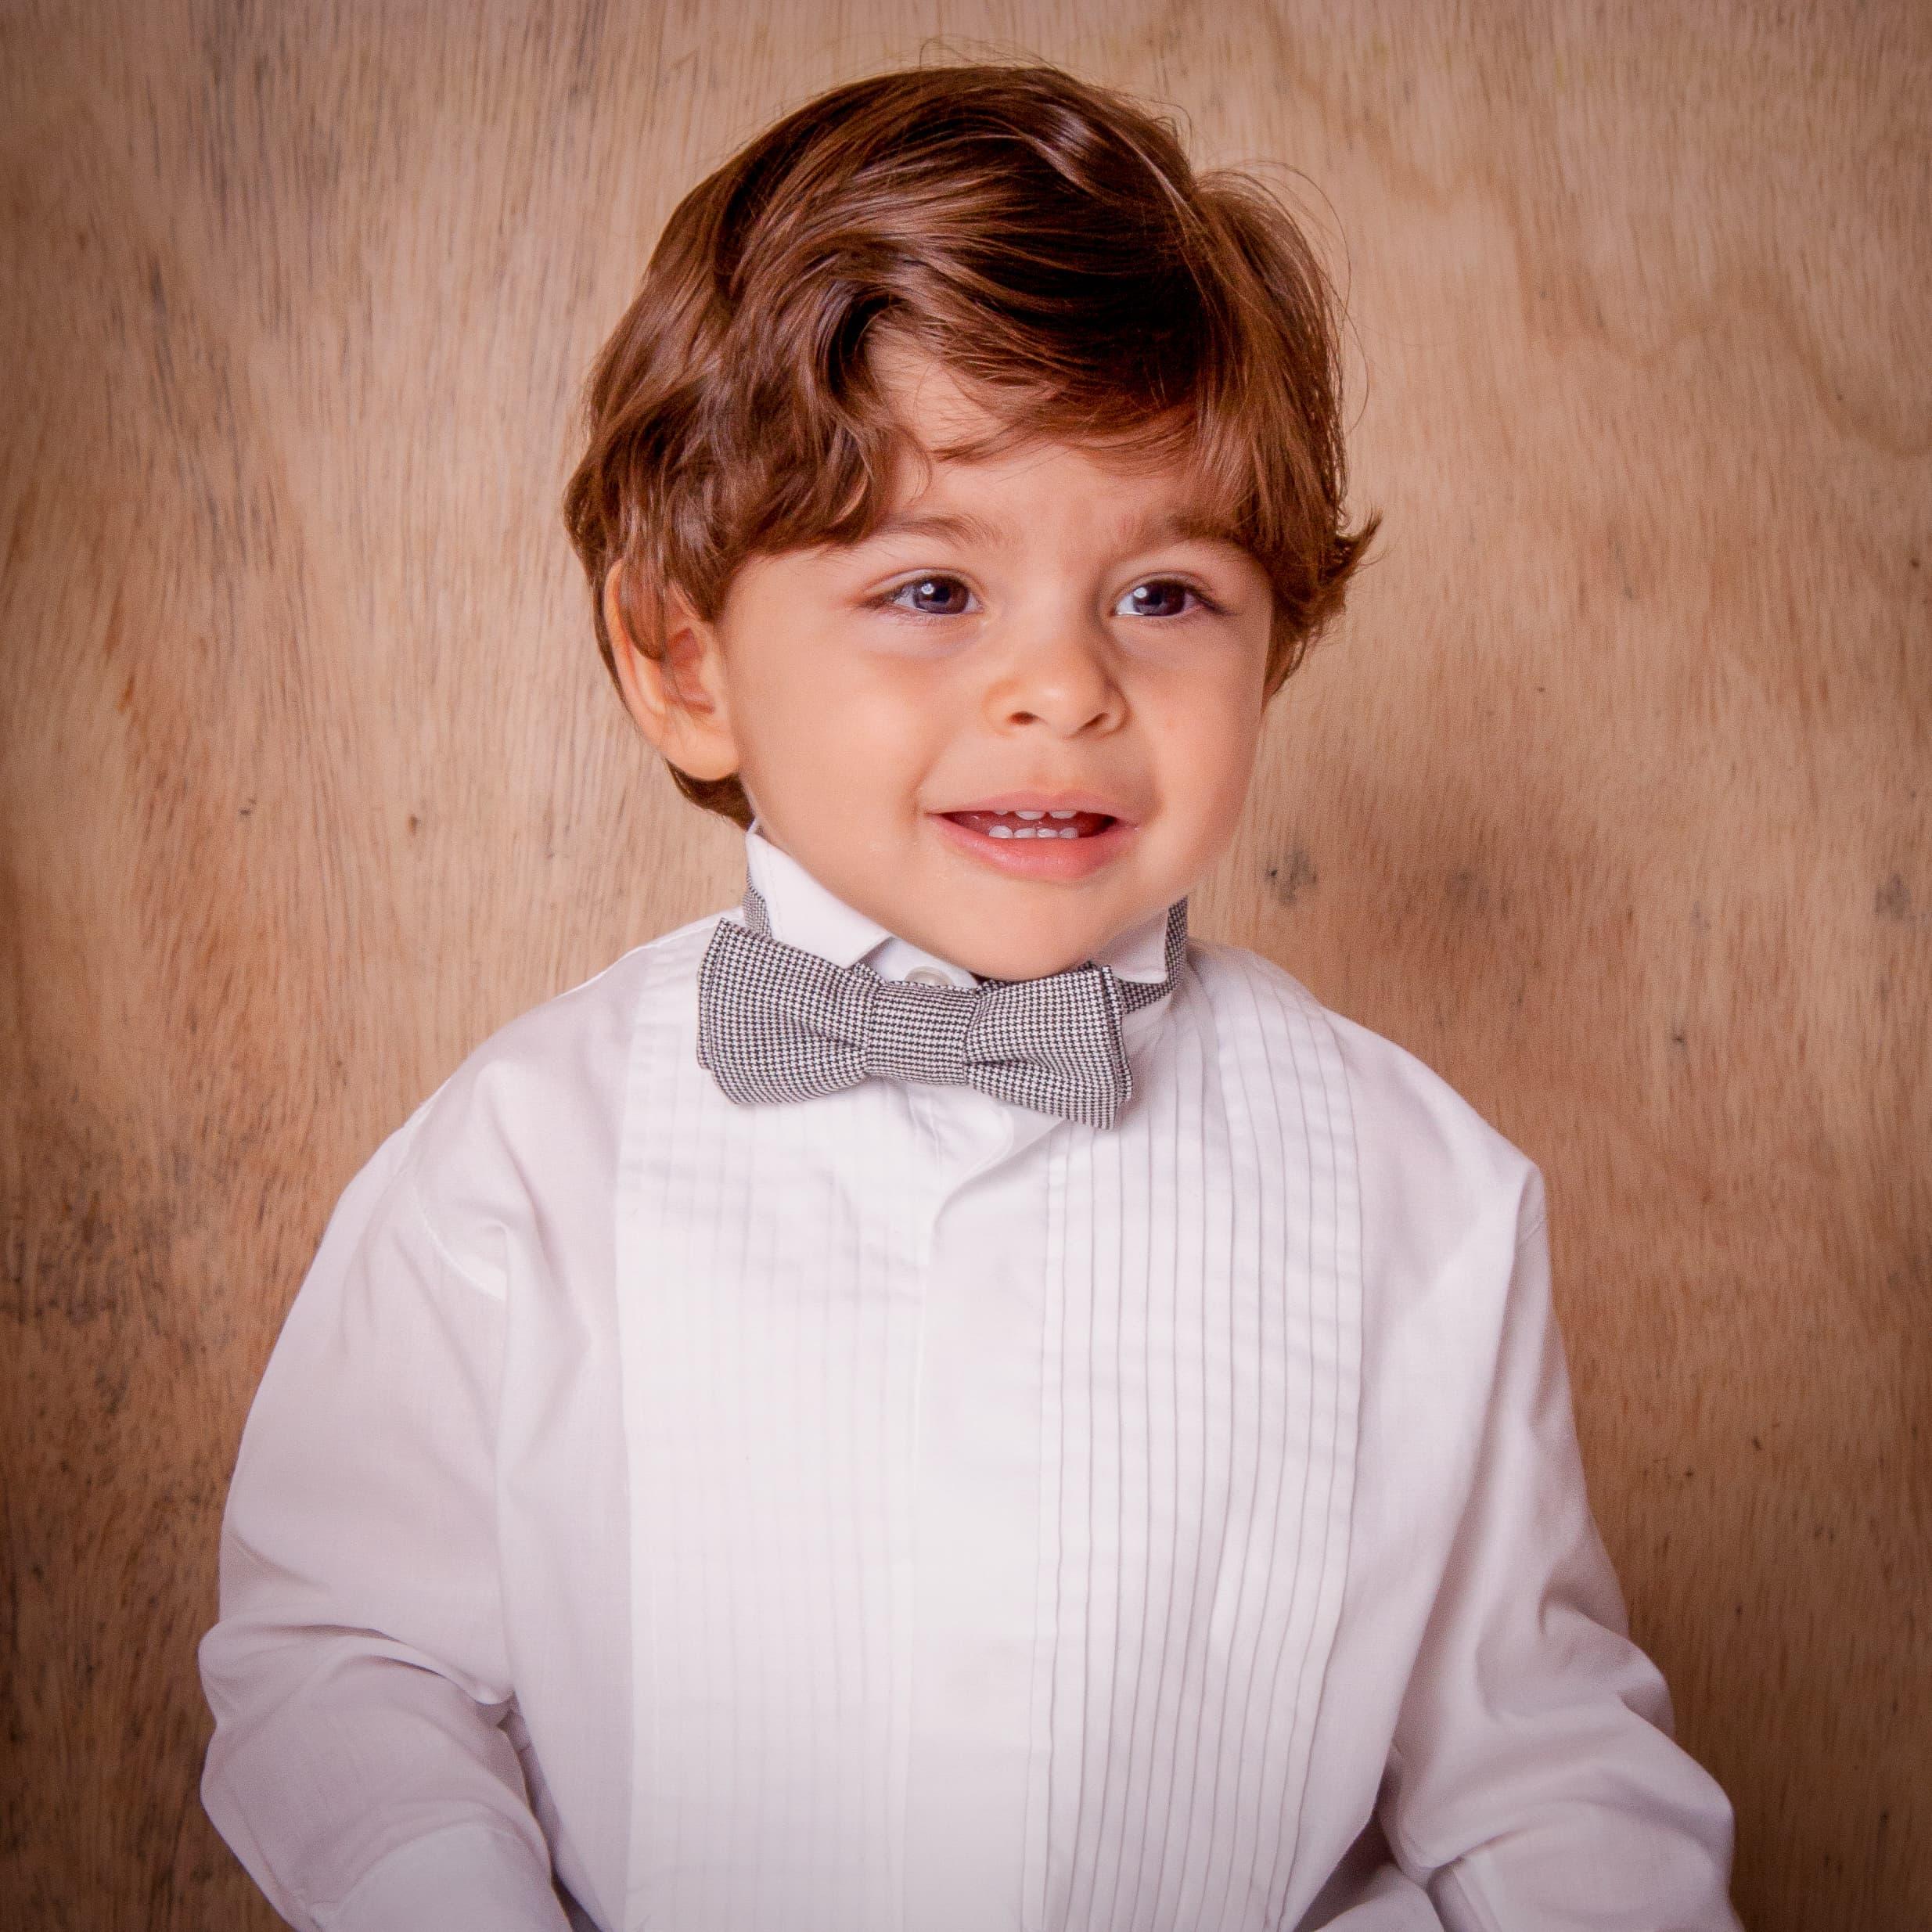 10 - Pajem de camisa branca e gravata